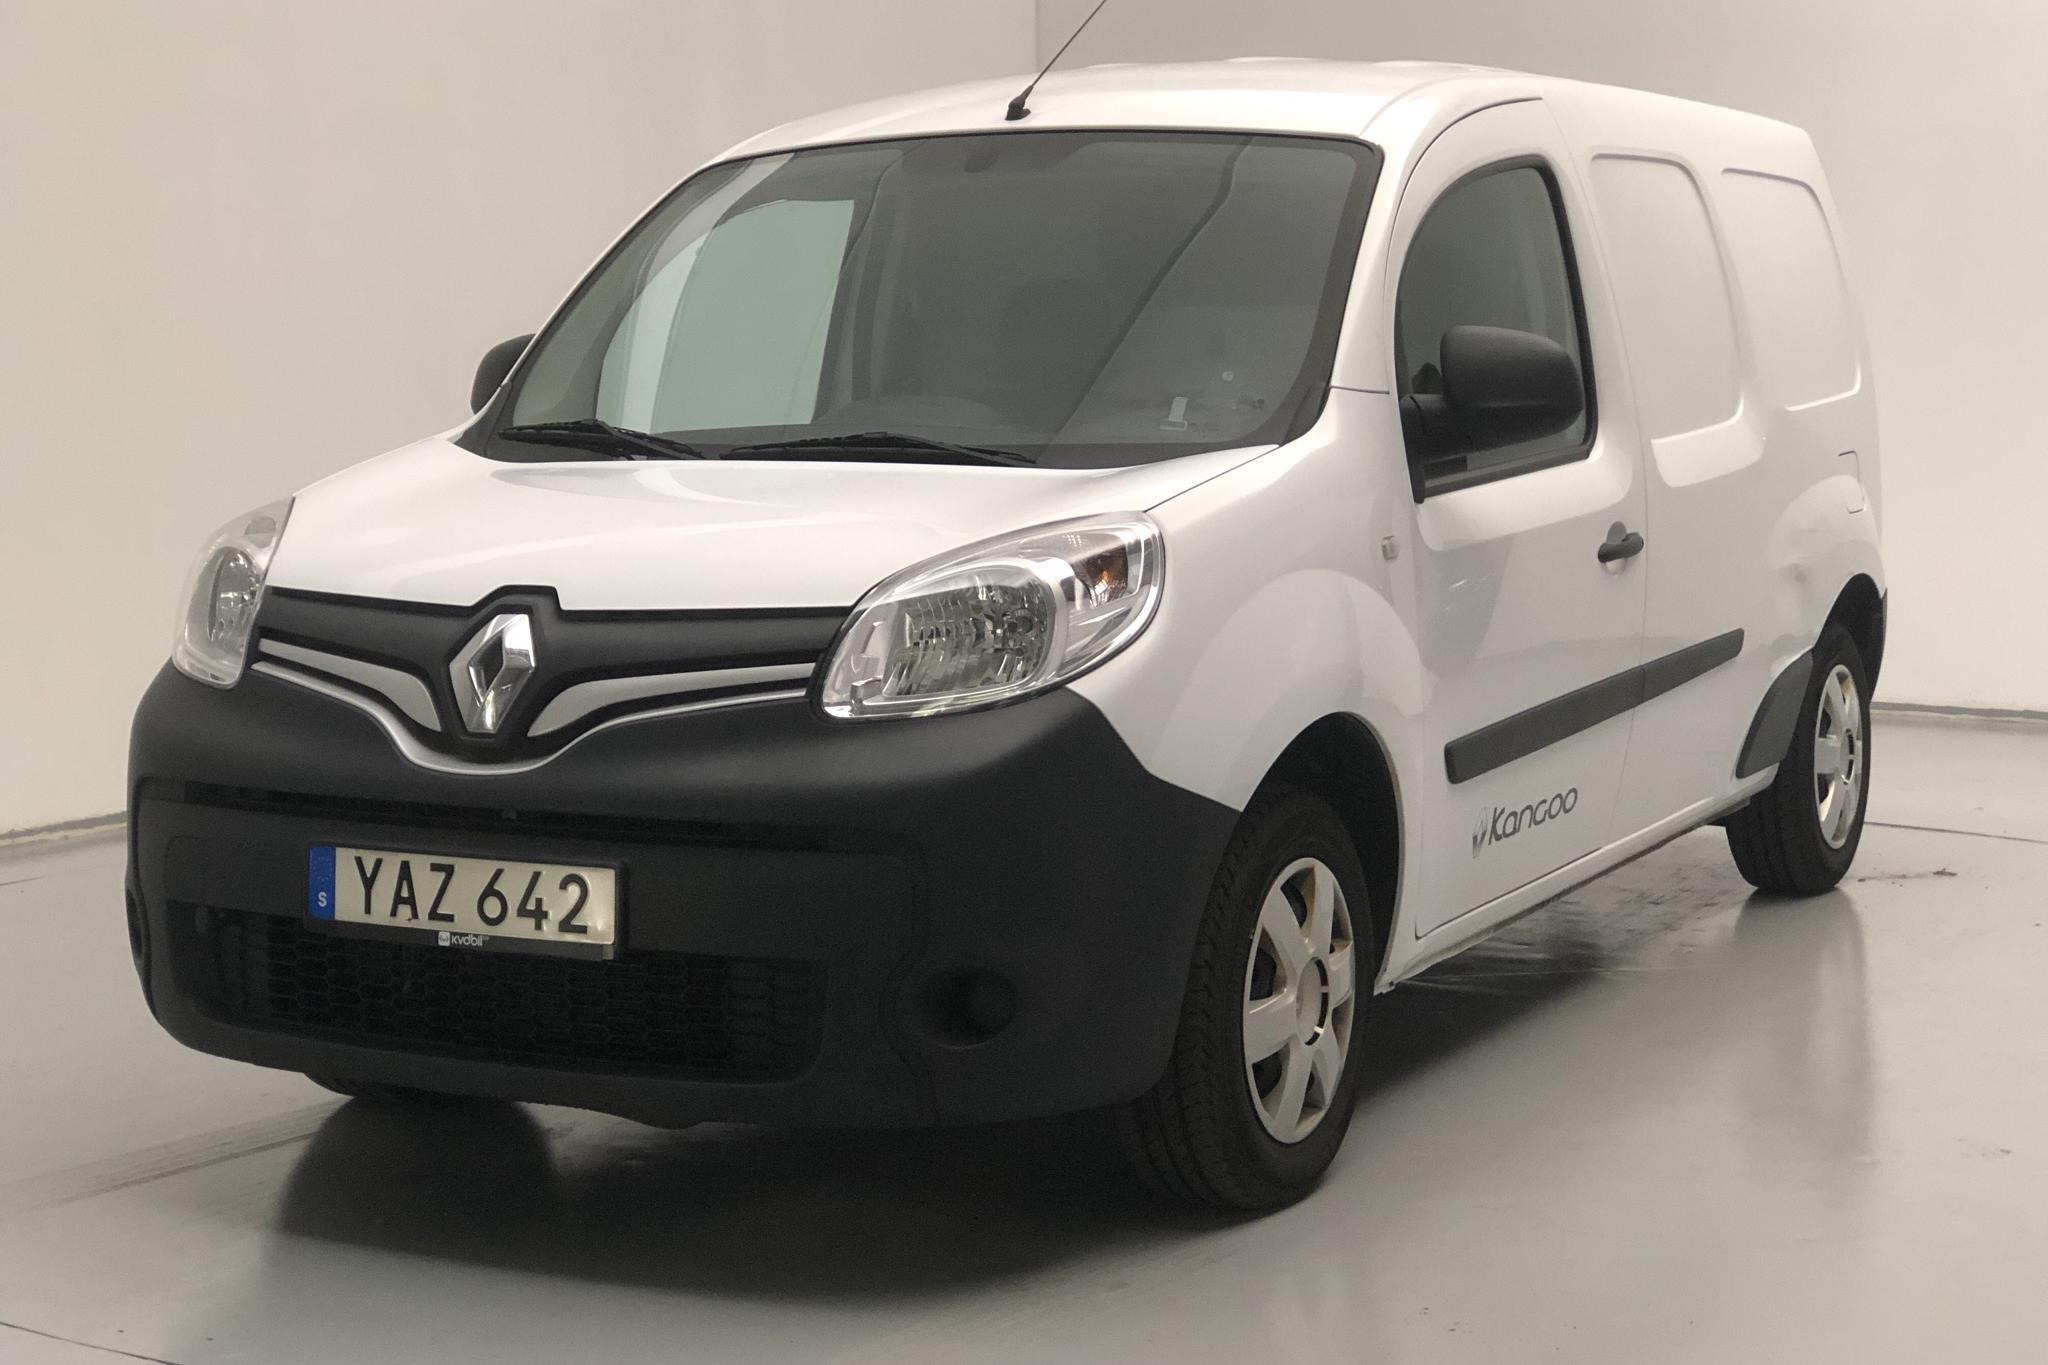 Renault Kangoo 1.5 dCi Maxi skåp (90hk)